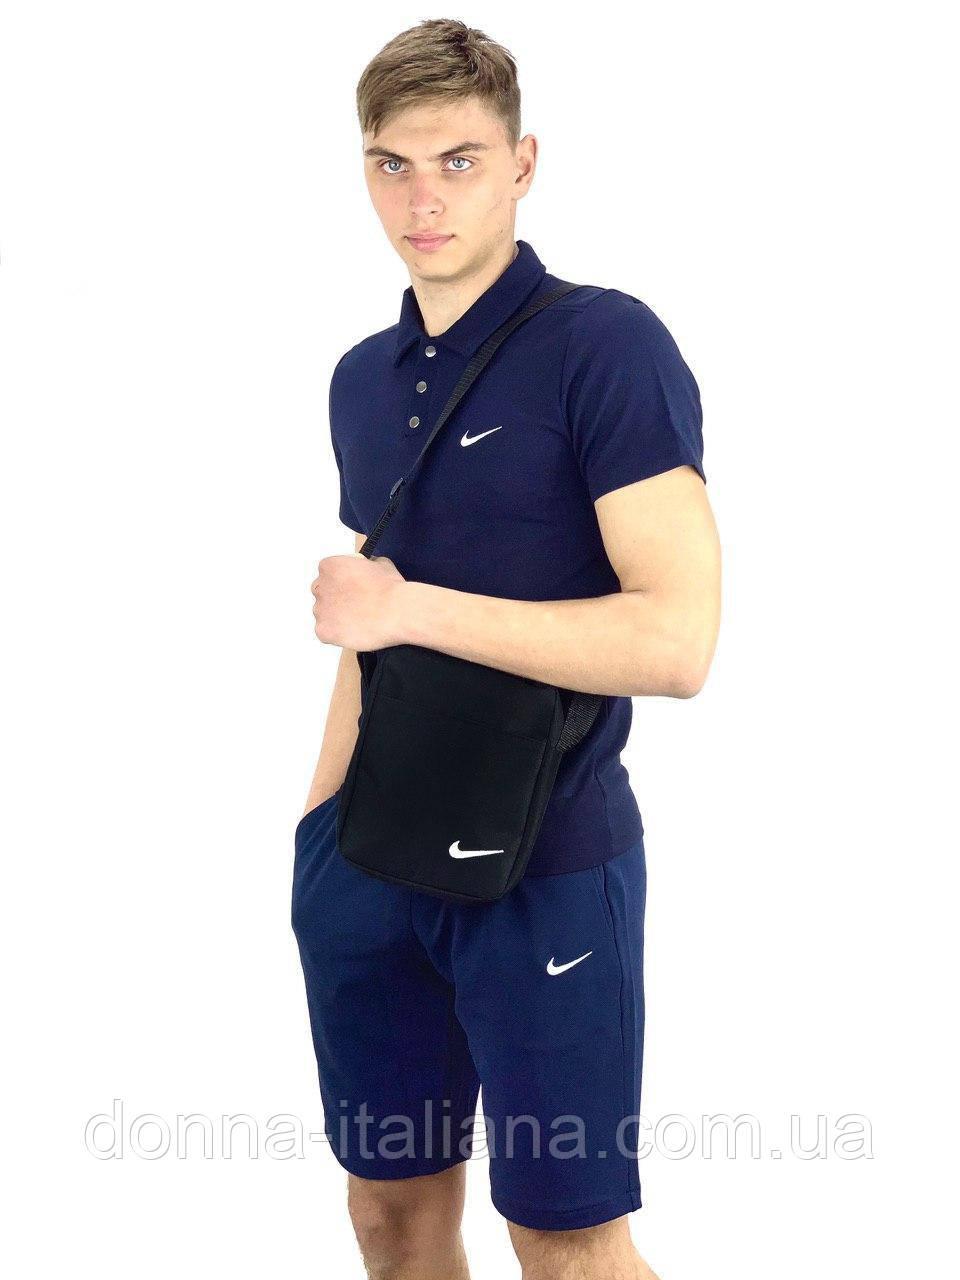 Комплект Футболка Polo+ Шорты+ Барсетка Nike Реплика S Синий (KomNikeBlue1/1)